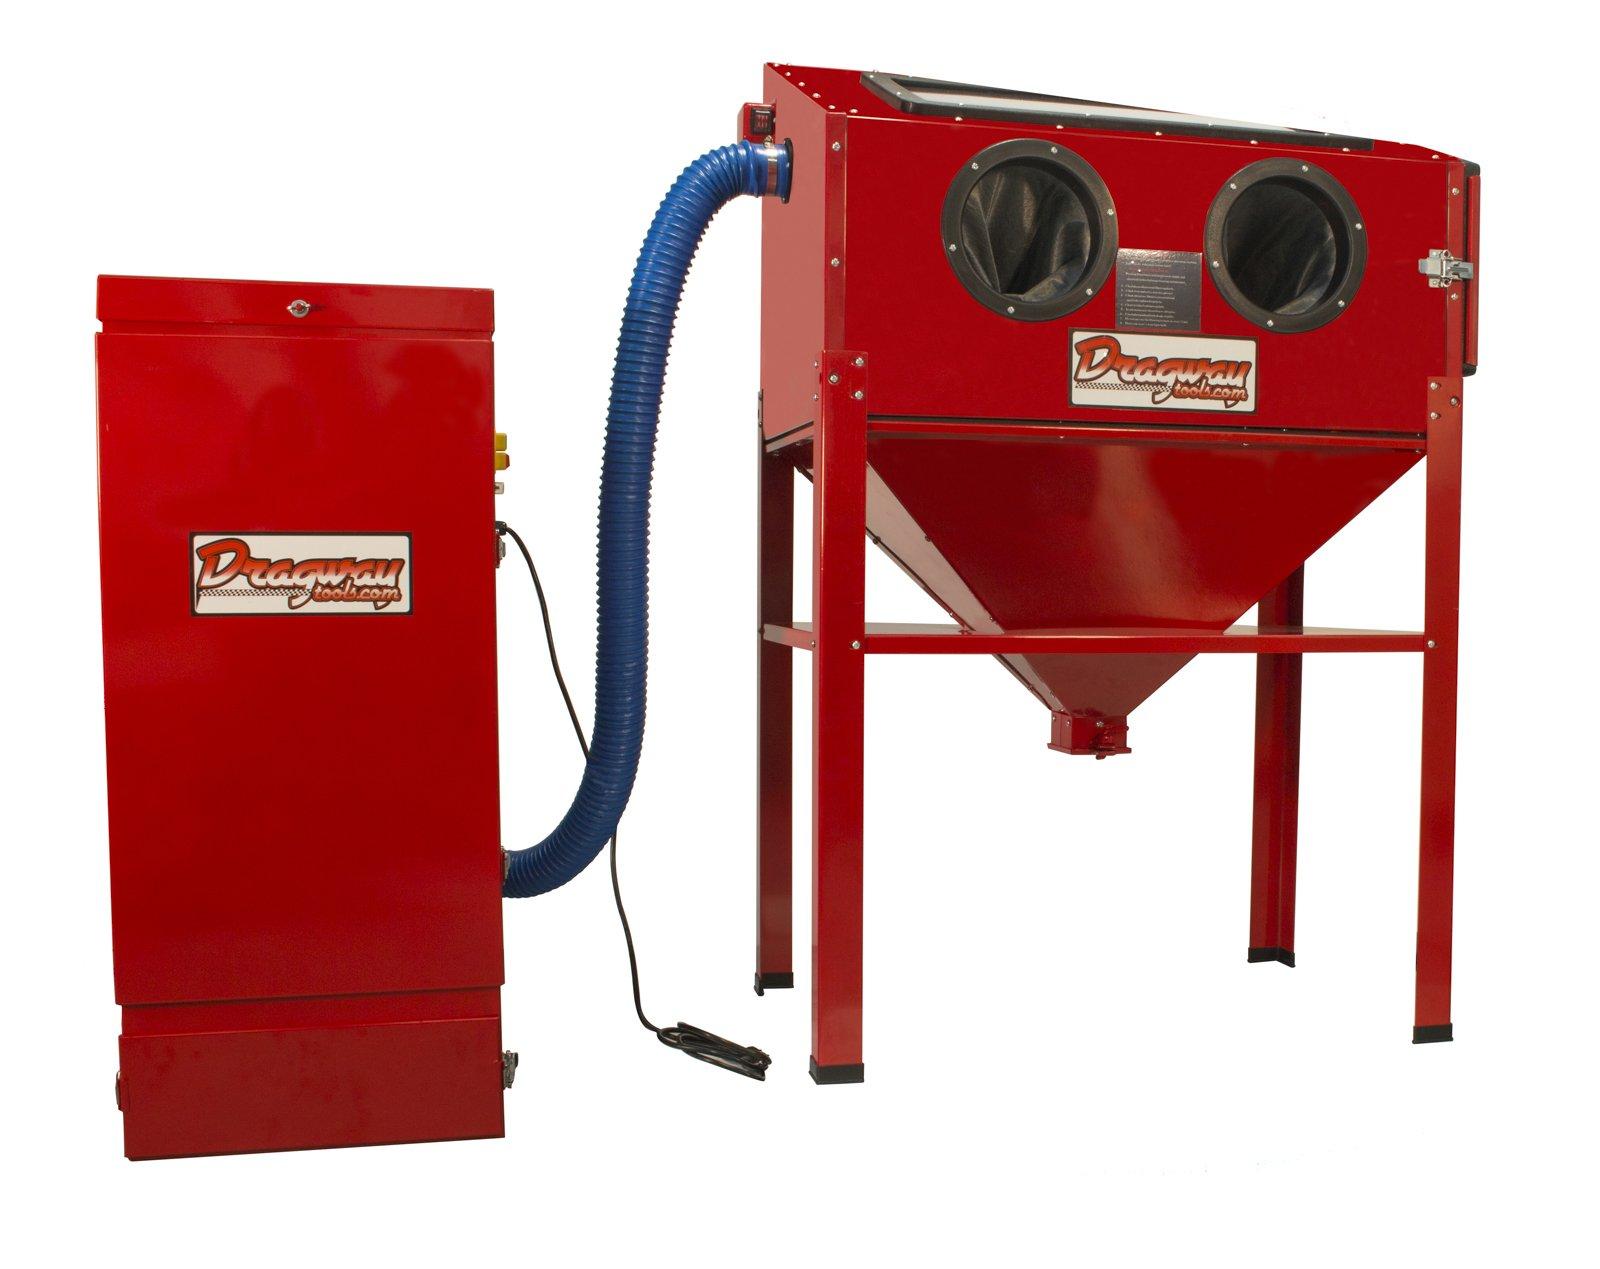 Dragway Tools Model 60 Sandblast Cabinet With Floor Standing Dust Collector